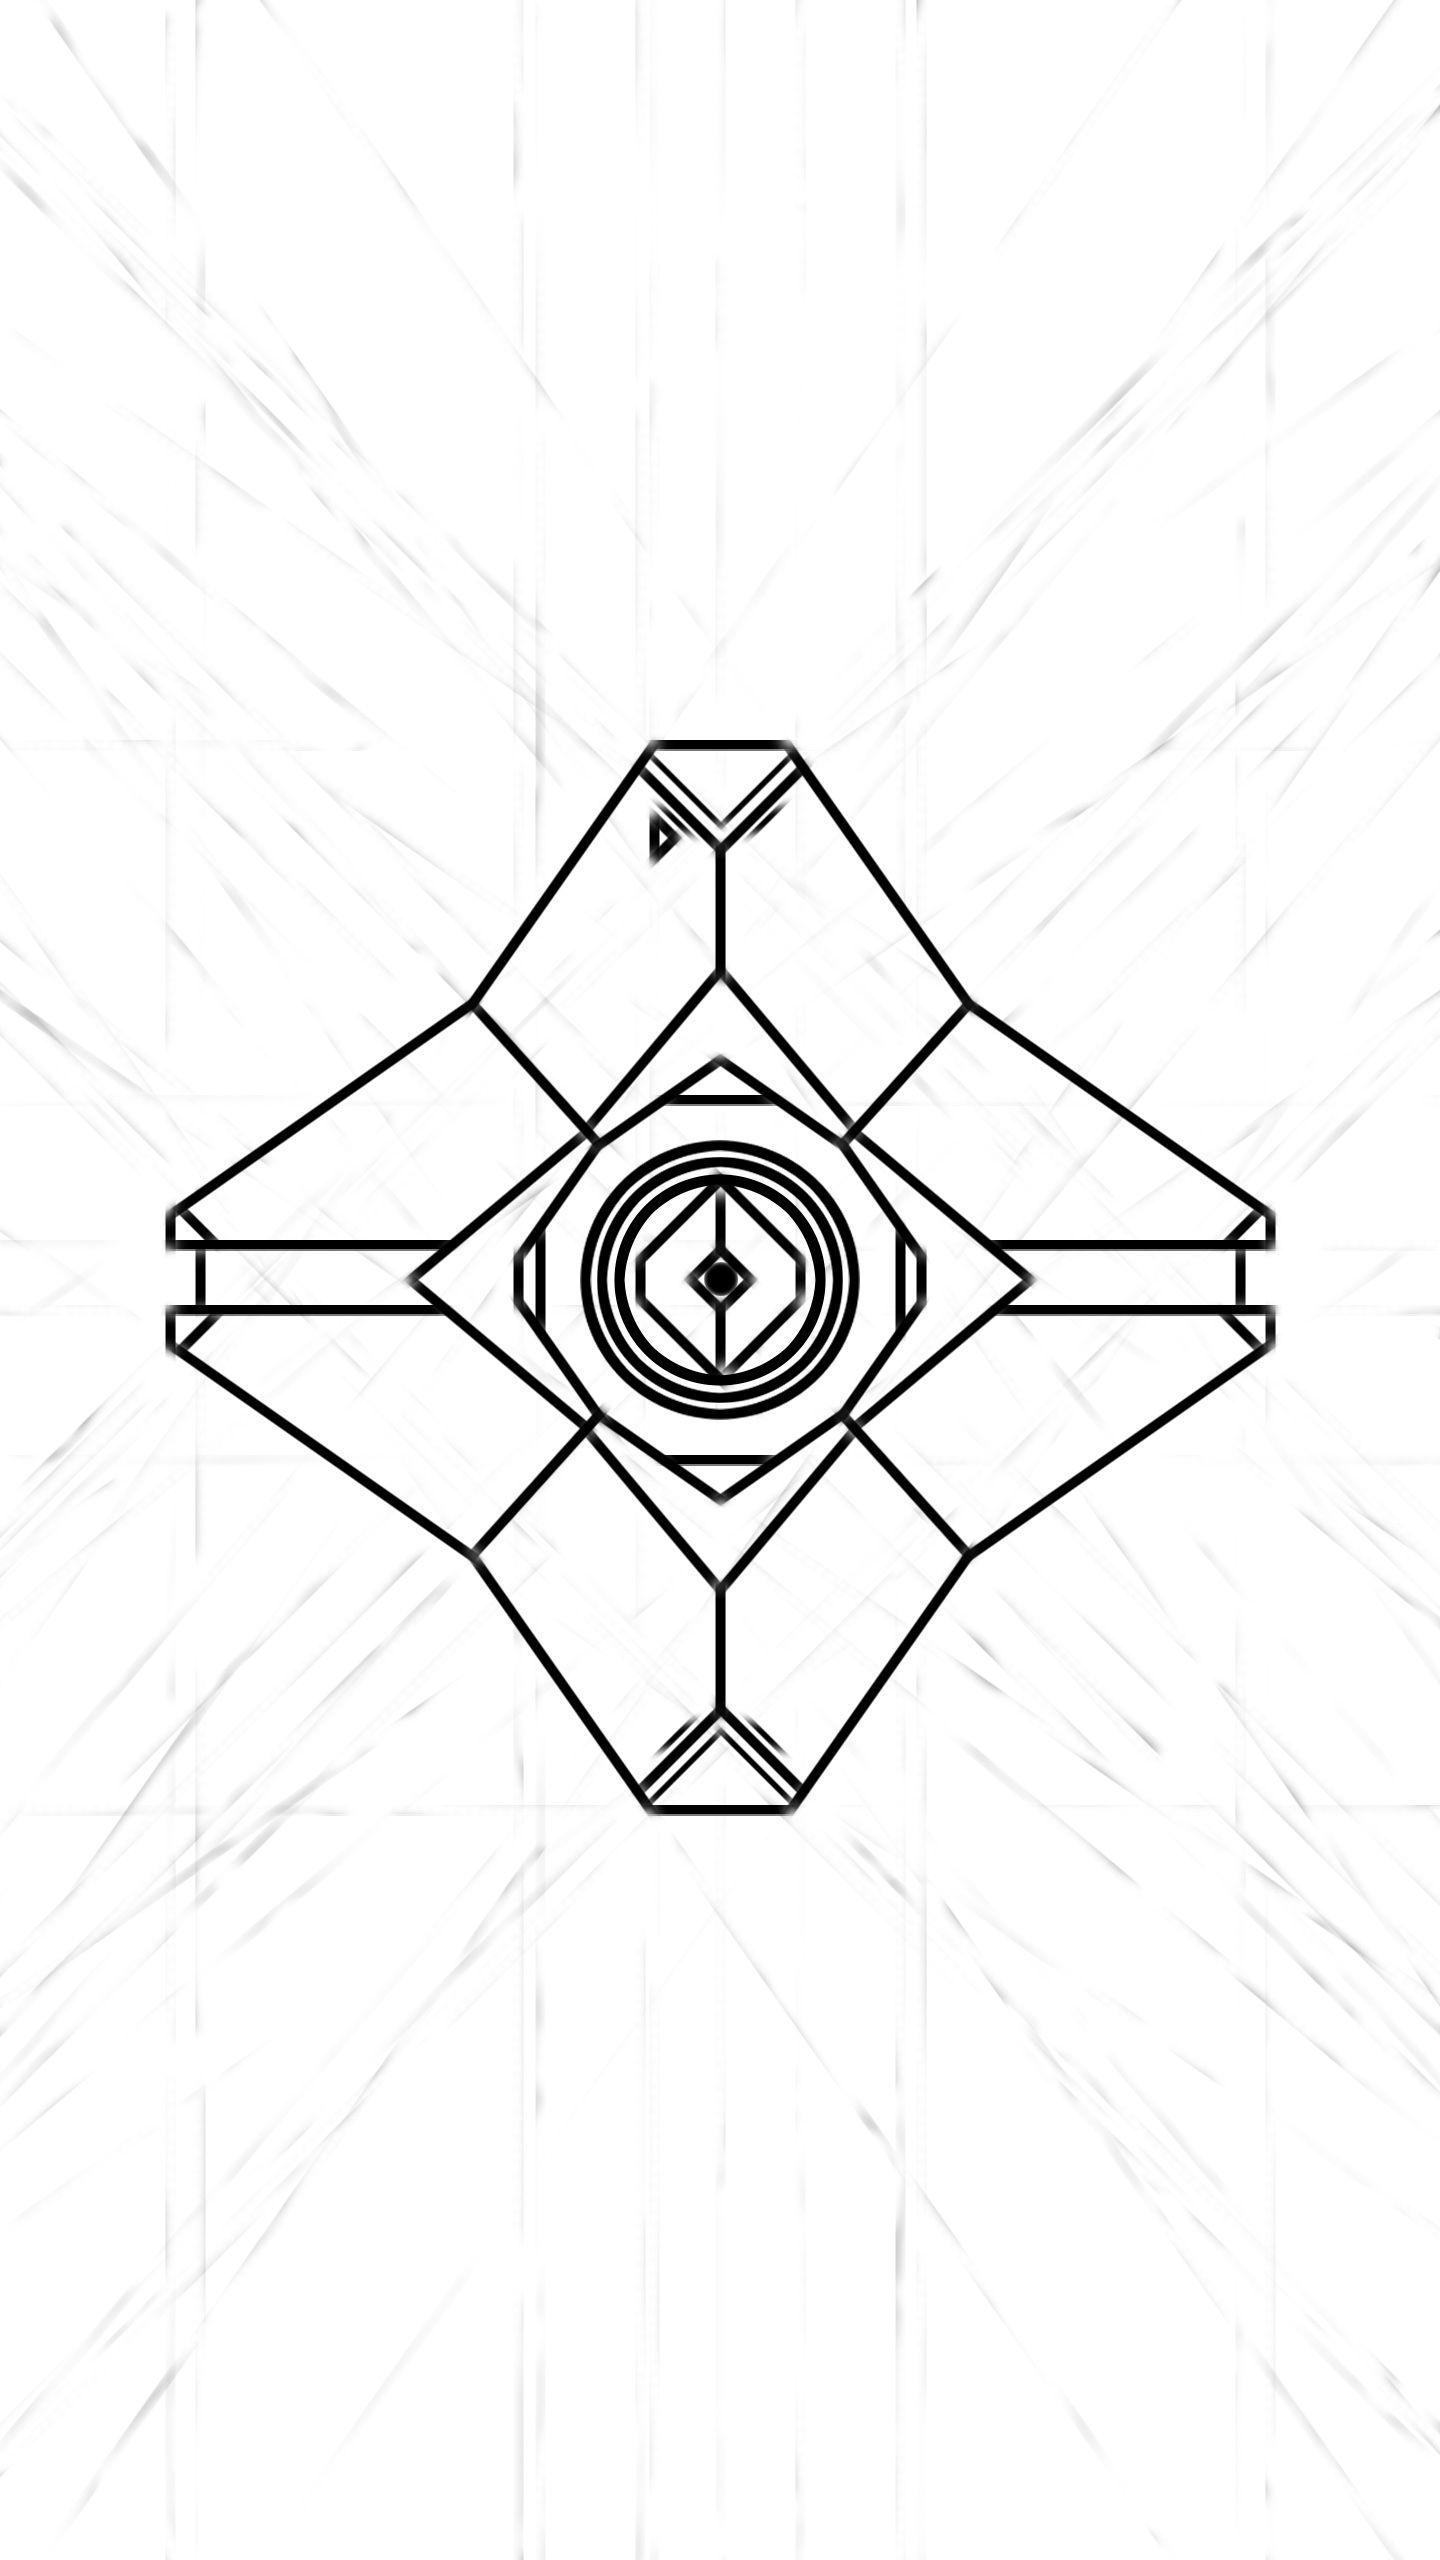 Destiny Ghost Doodle Wallpaper Work In Progress Ink Pinterest